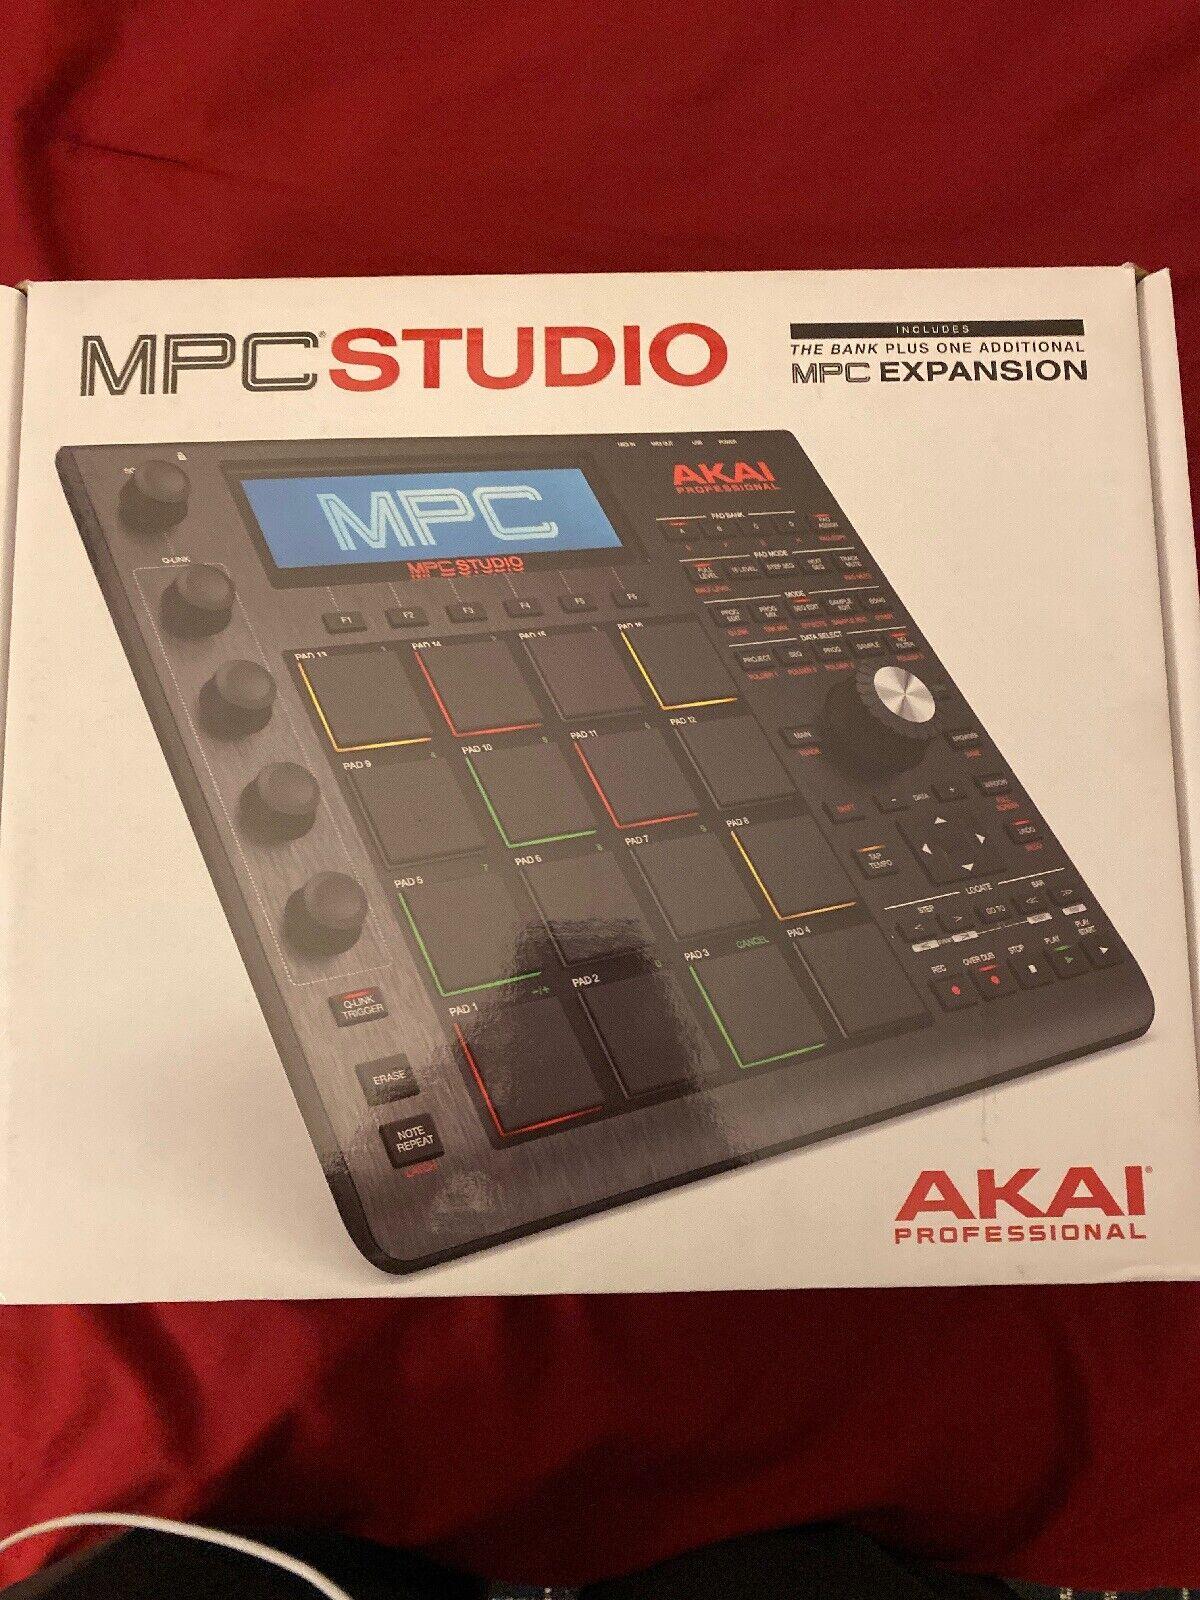 Akai professional mpc studio schwarz